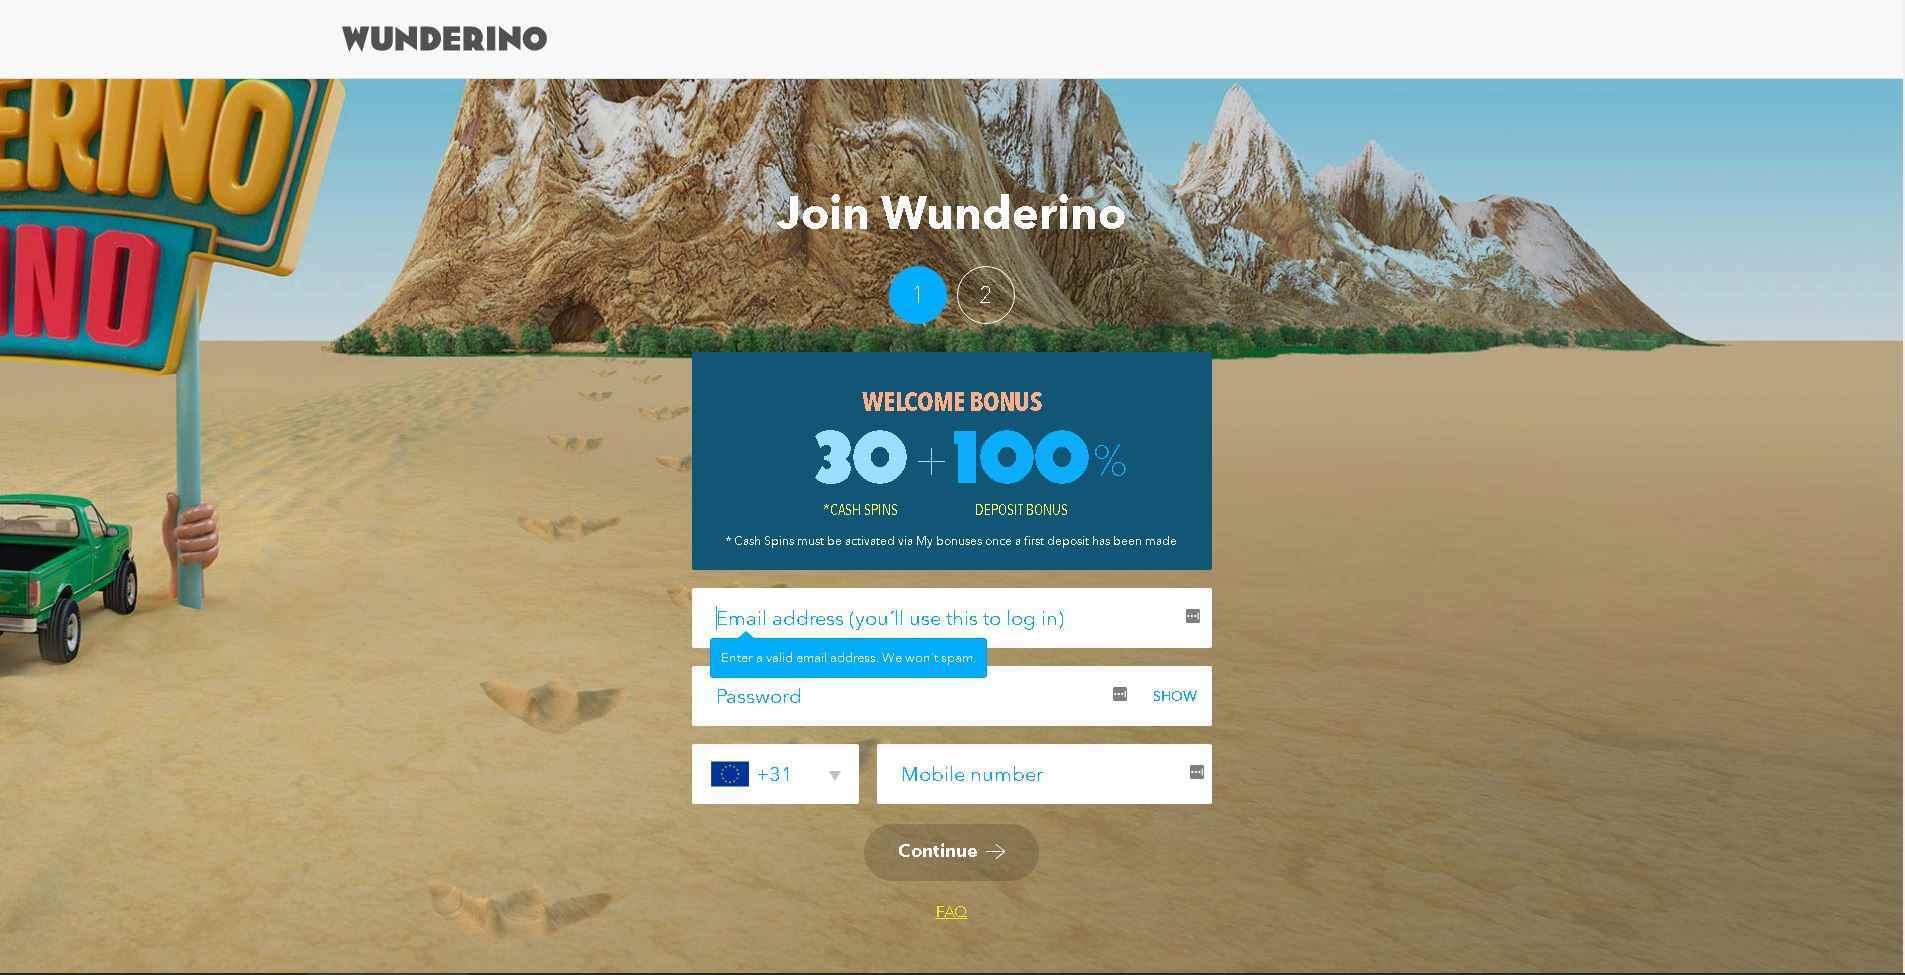 Wunderino Registration